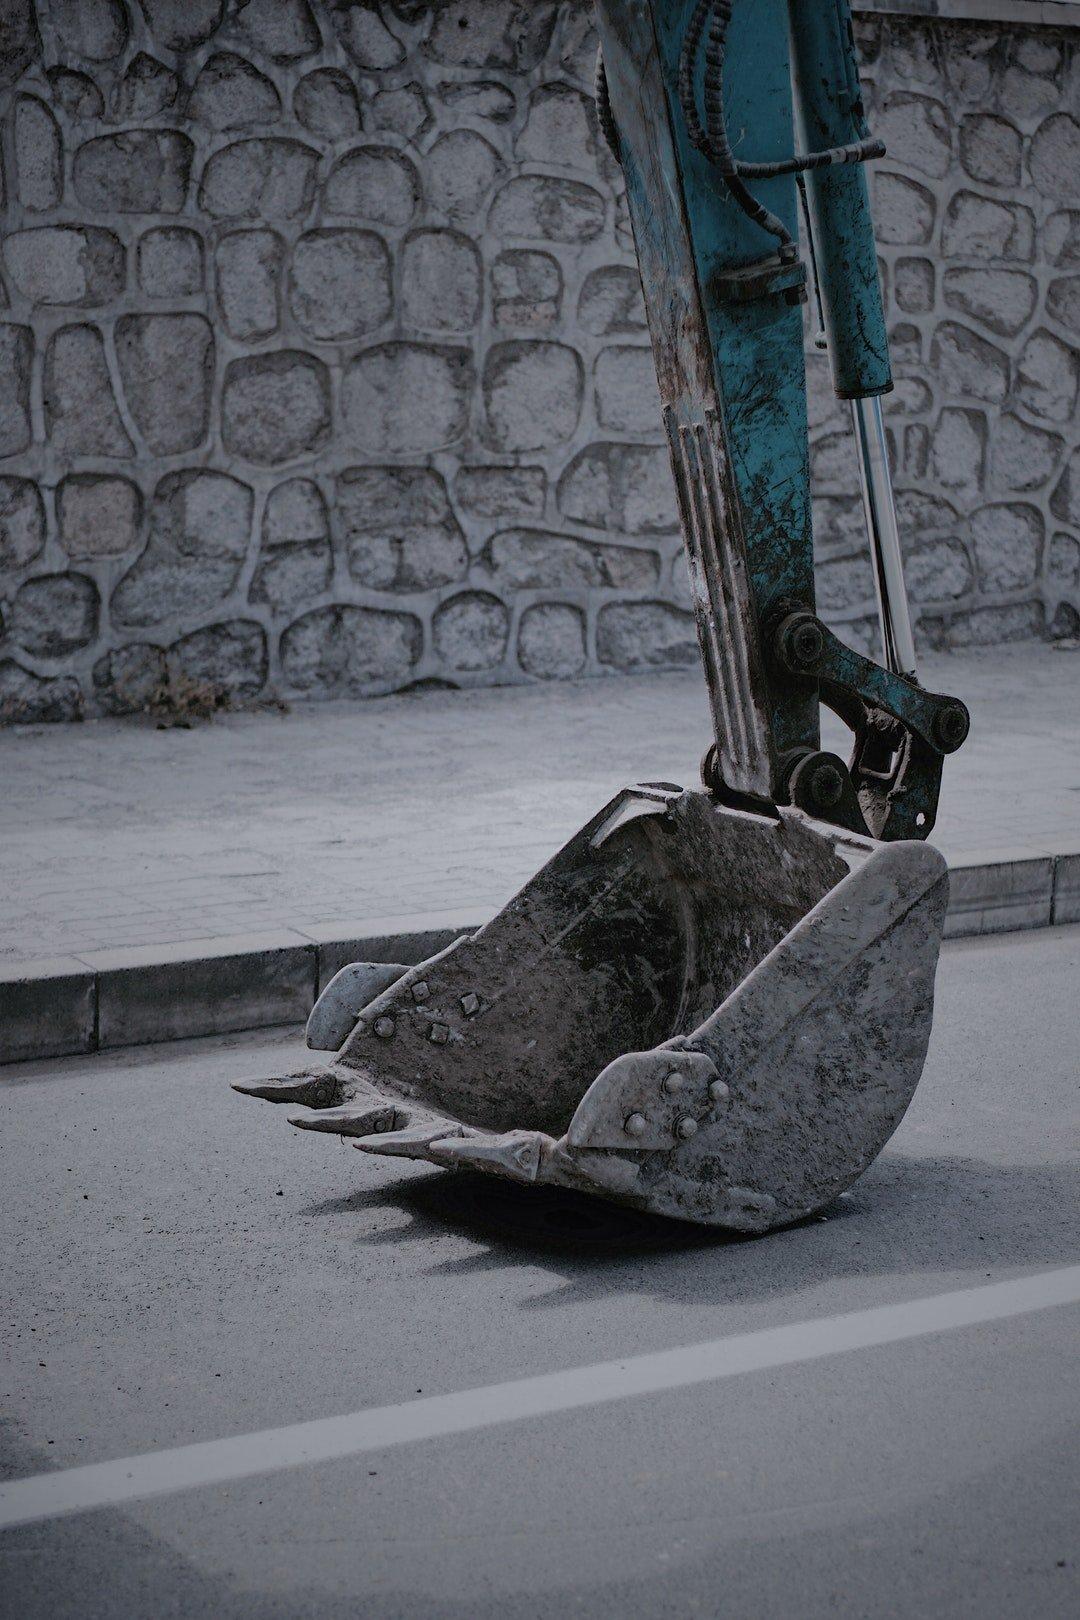 Excavator Equipment by Kuan Fang on unsplash.com for E&R Bobcat & Excavator Services